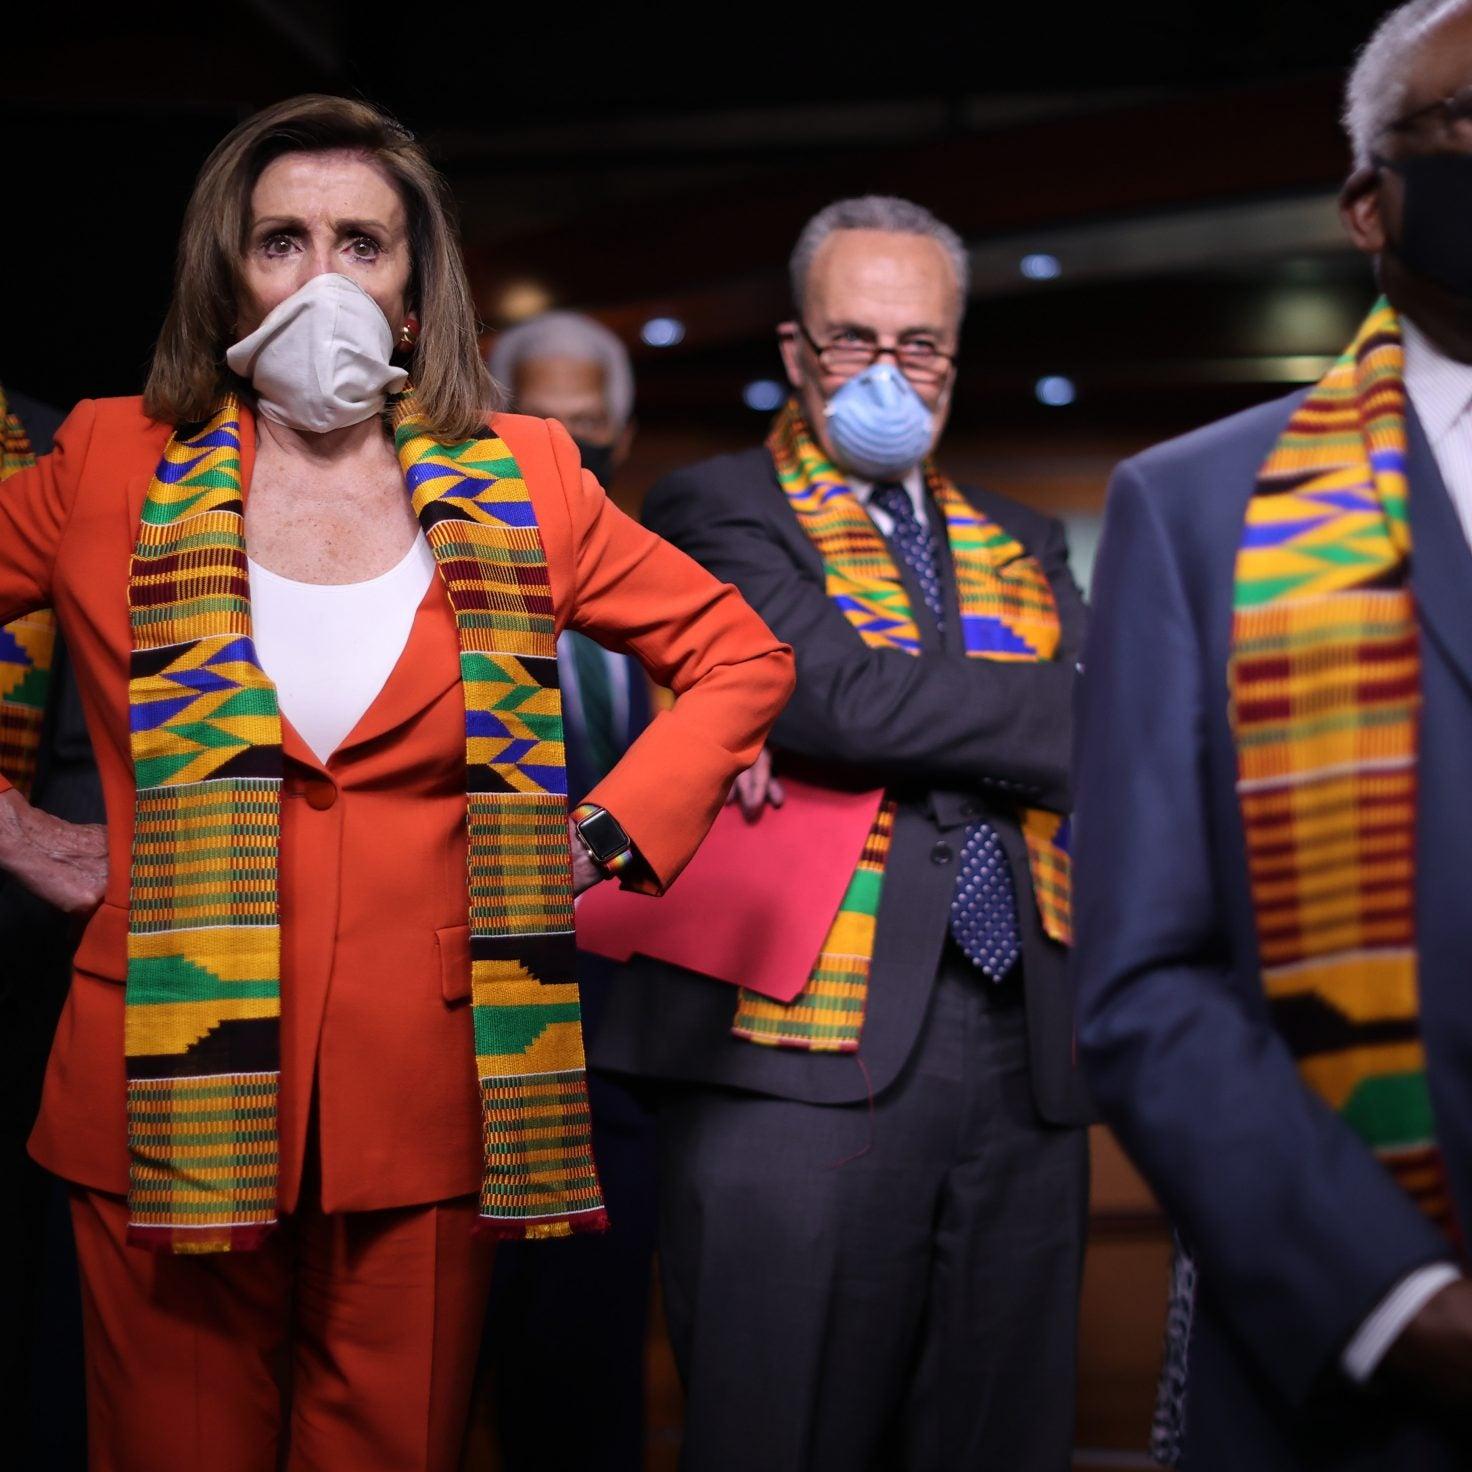 Donning Kente Cloth Congressional Democrats Unveil Police Reform